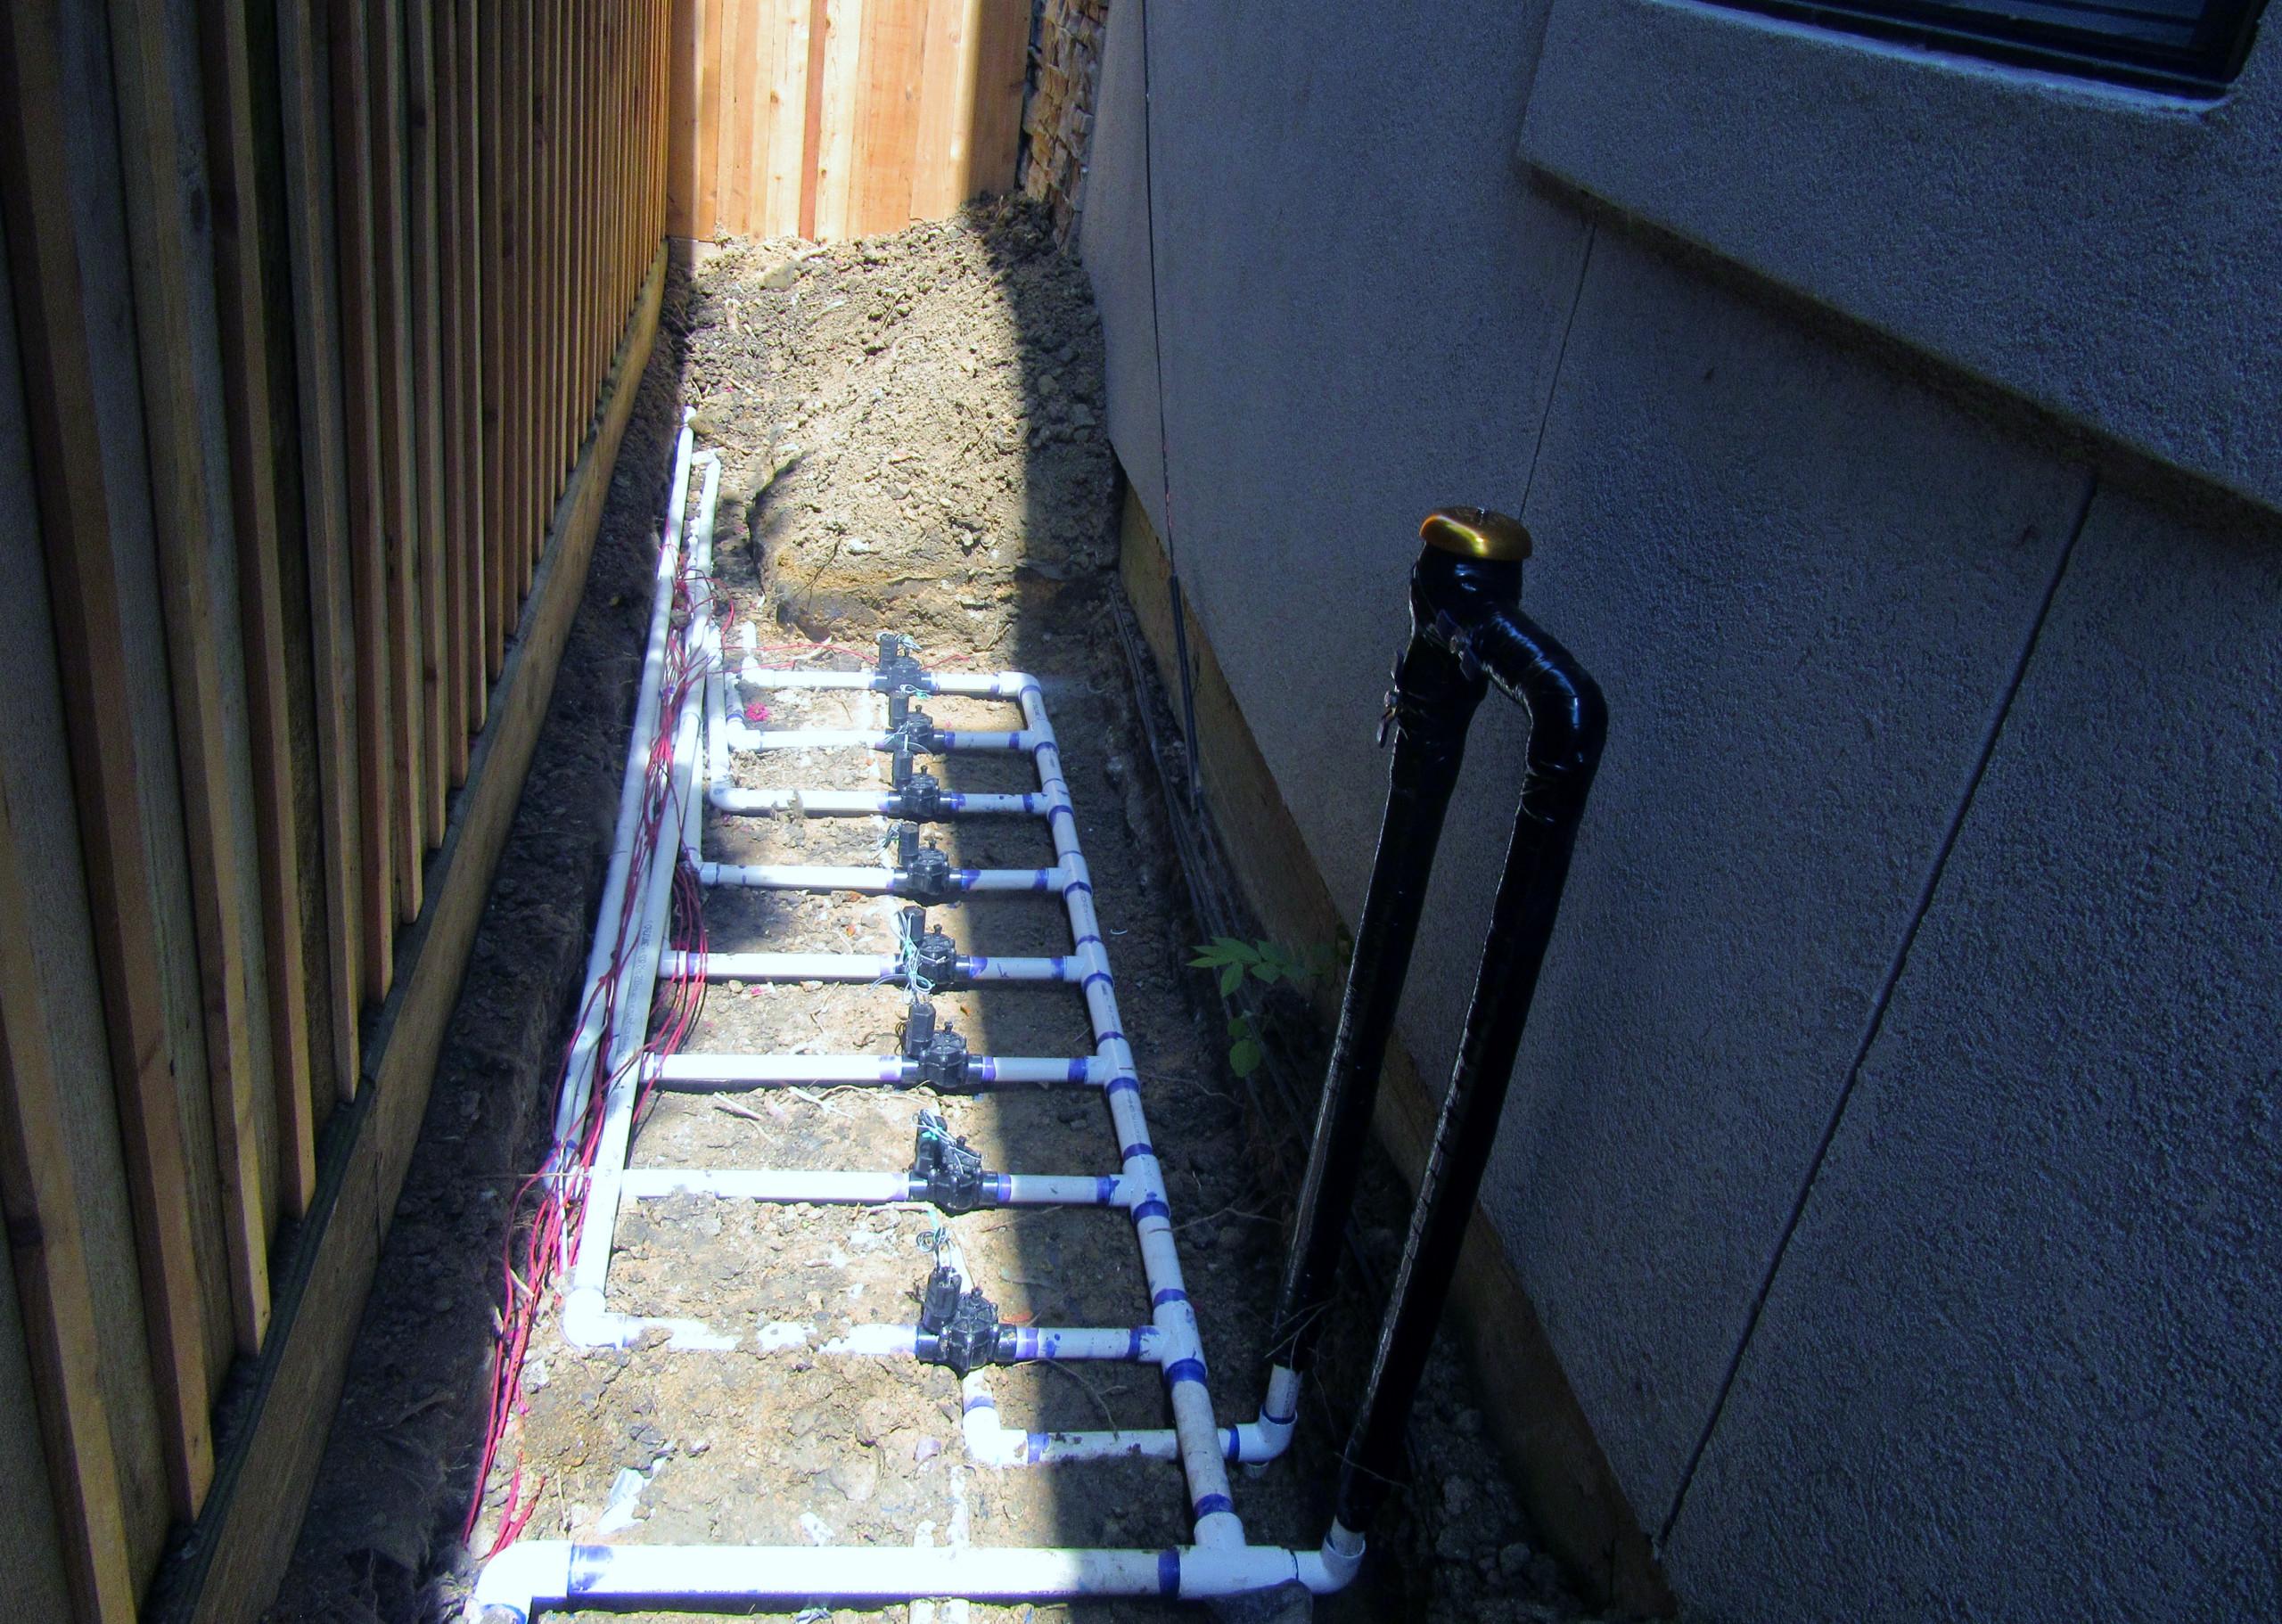 Montrose Construction Journal